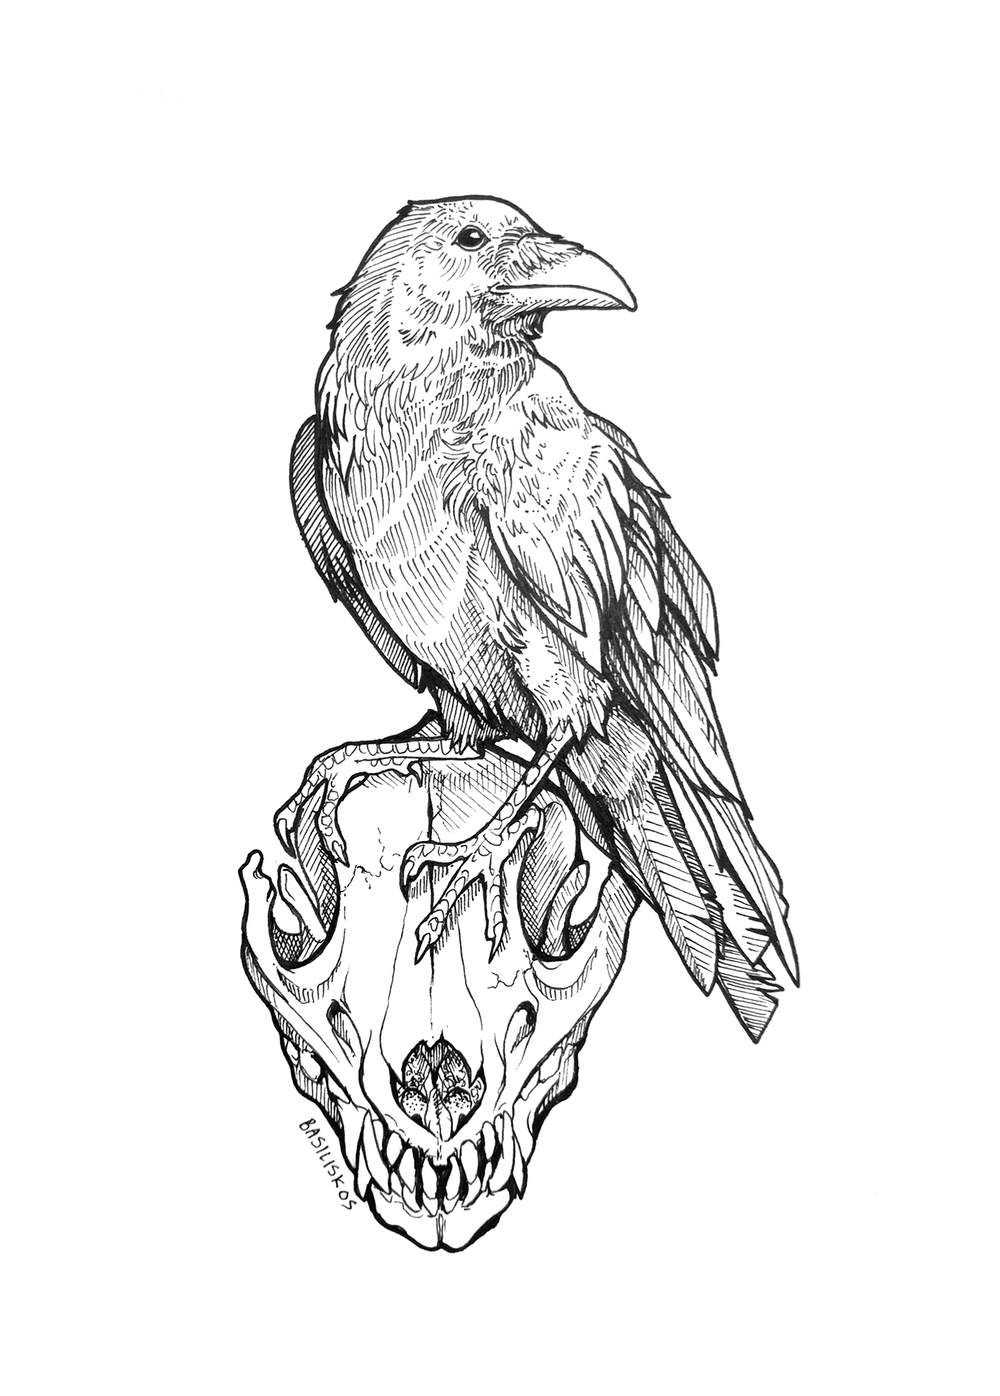 @CT_Bergstrom,Corvus corax